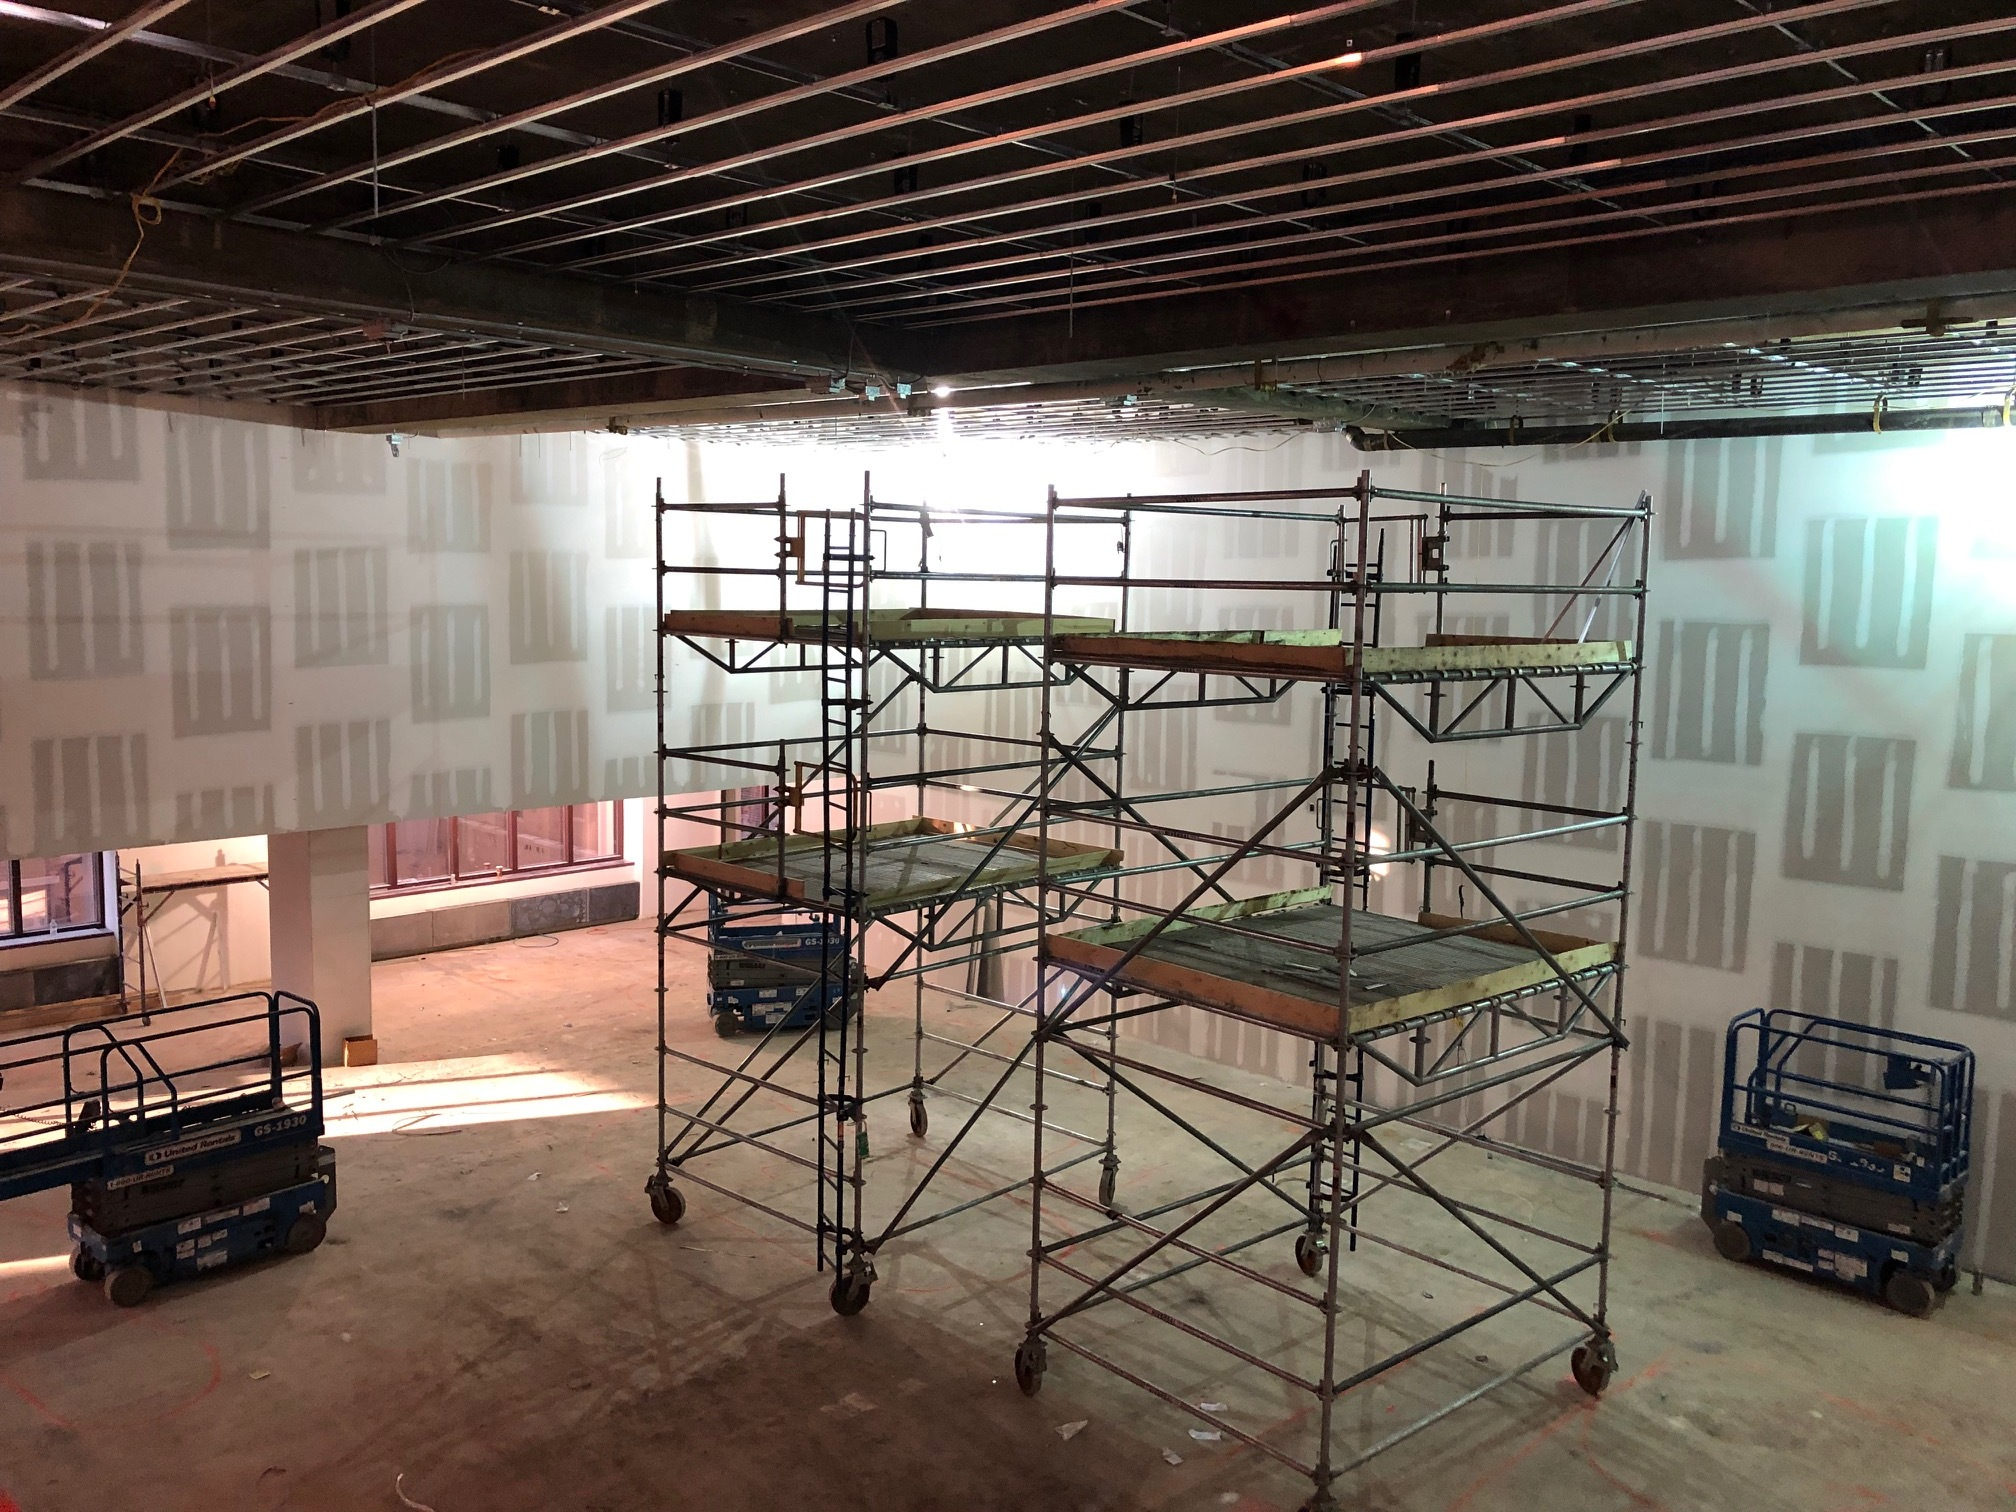 Studio 11A (SE corner from mezz) 1-25-19